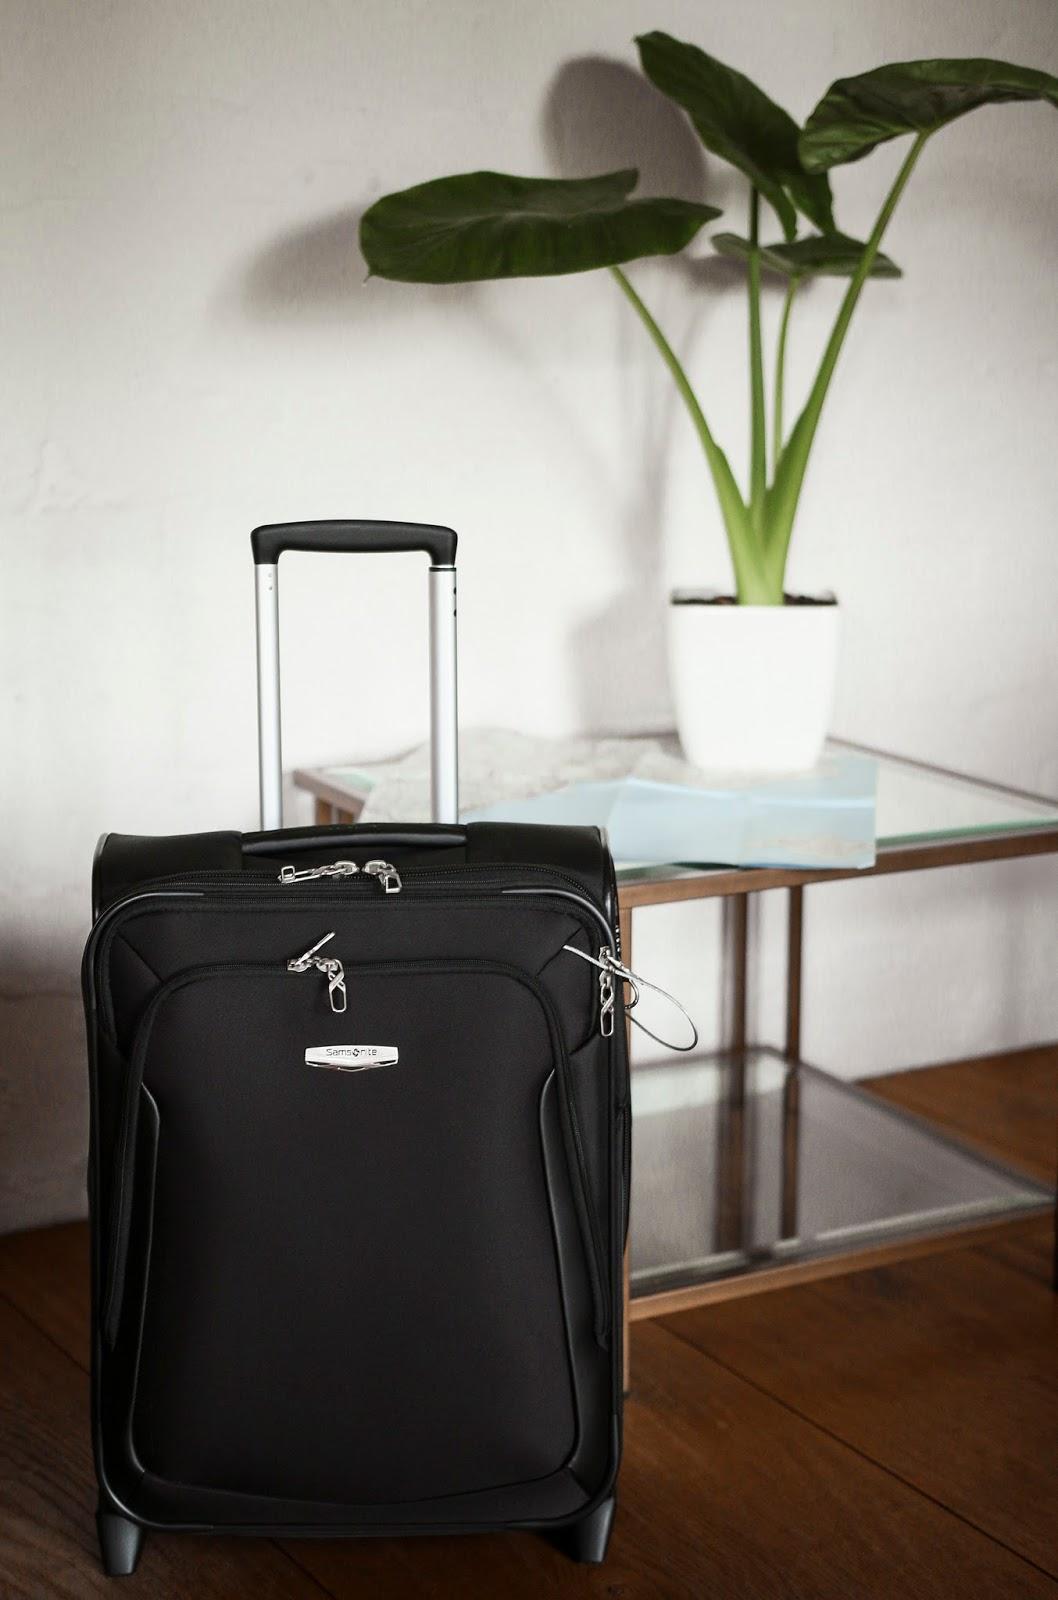 Vn0m8nw Mixtdé Samsonite Koffer Beste Duifhuizen Handbagage Tassen Voor 35c4ARjqSL